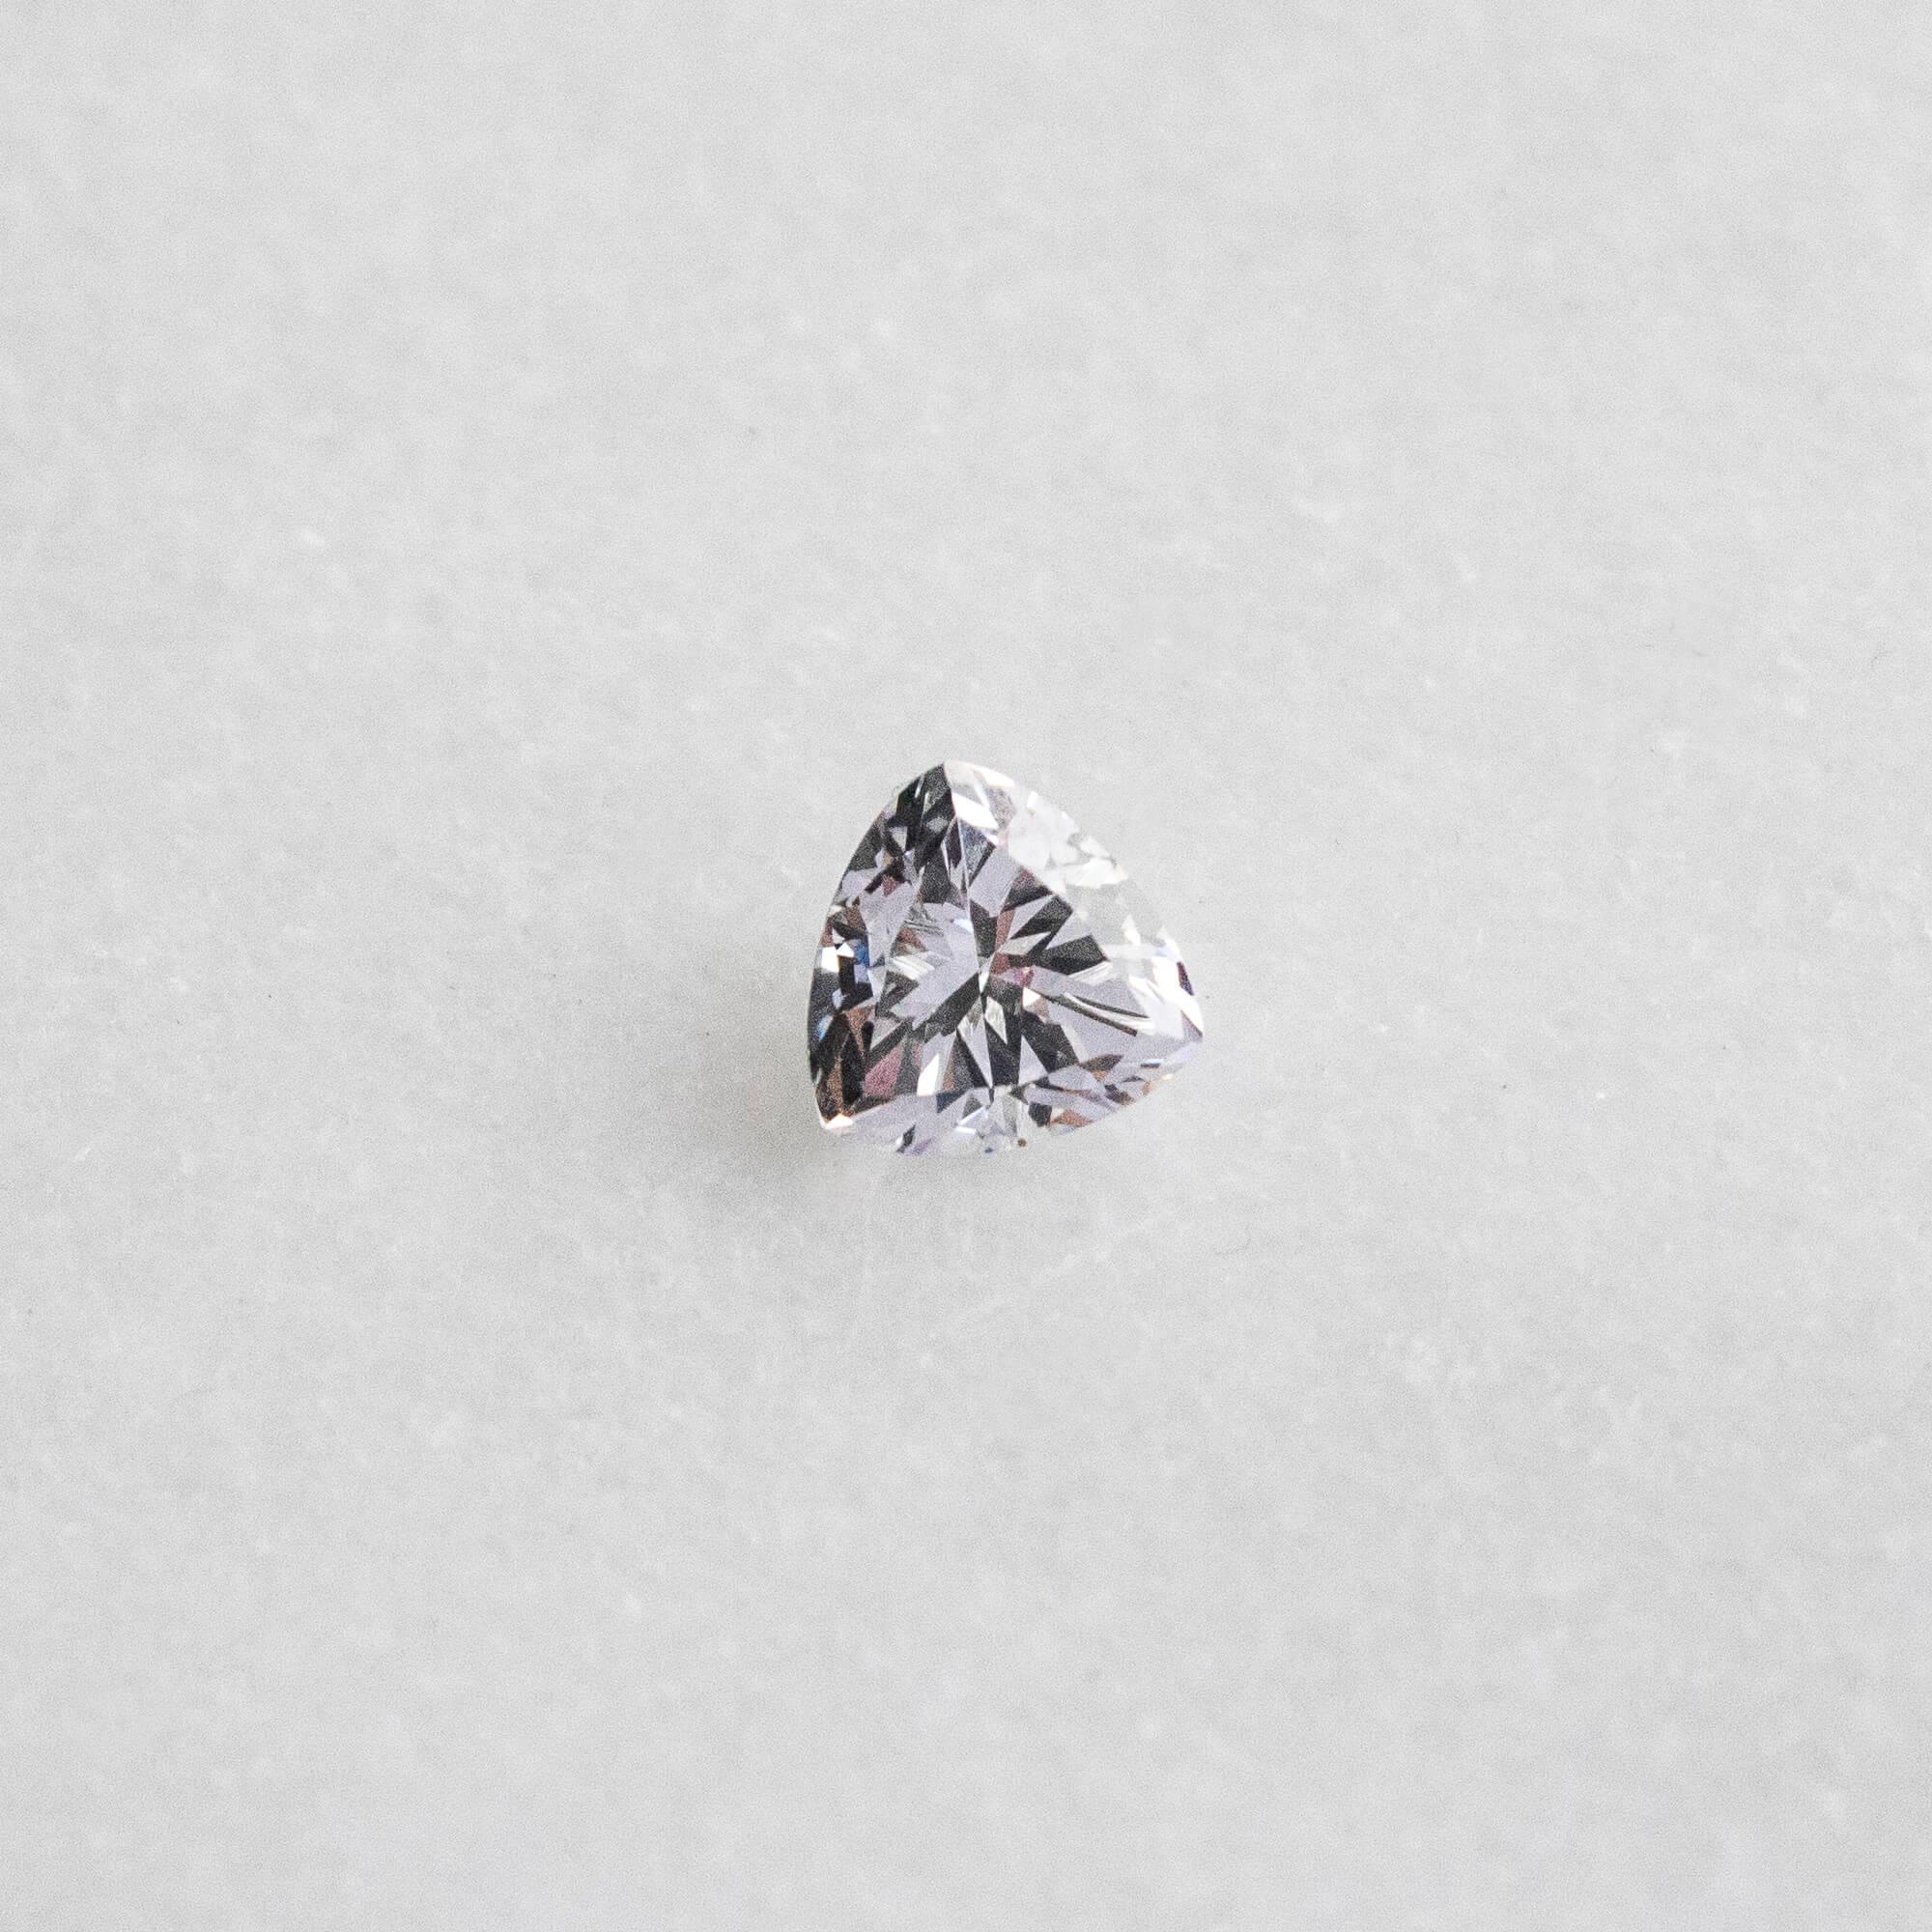 A Trillion Nexus Diamond alternative.